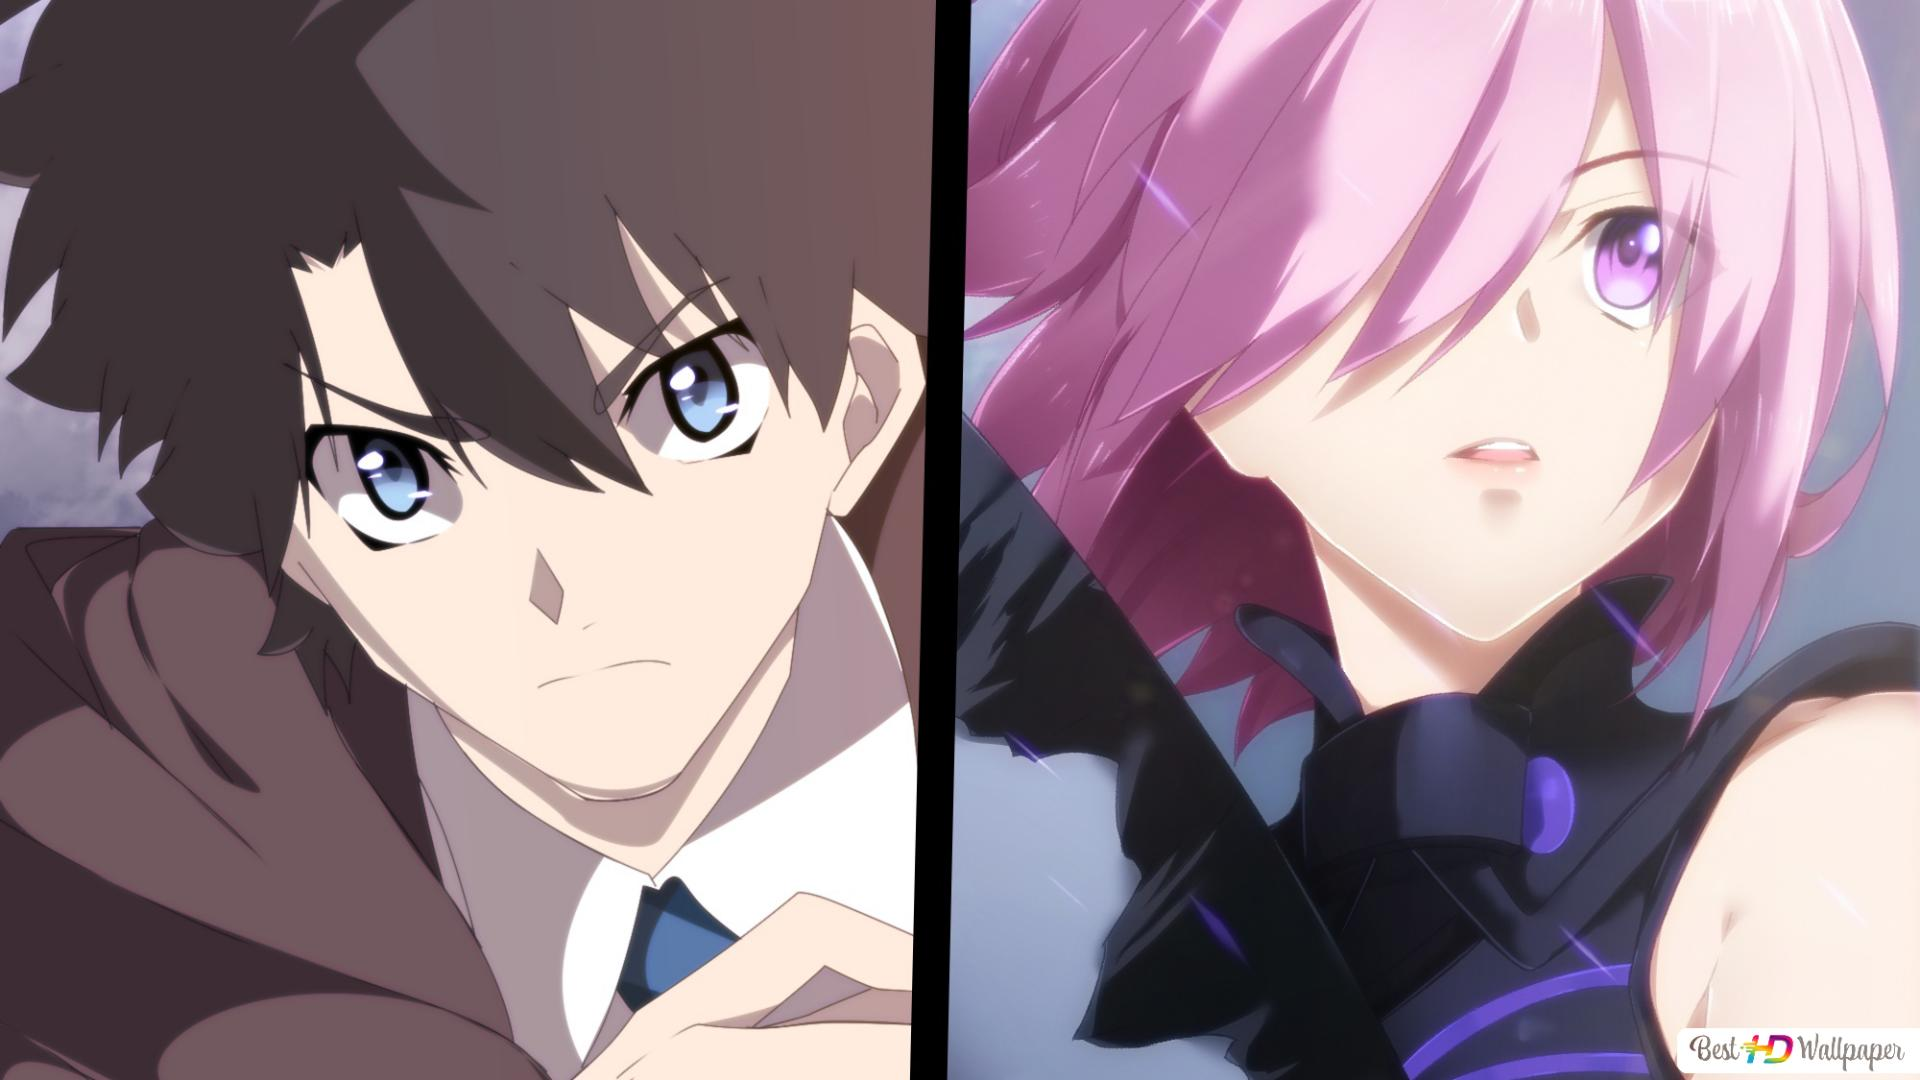 Fate Grand Order Ritsuka Fujimaru Mashu Kyrielight Hd Wallpaper Download